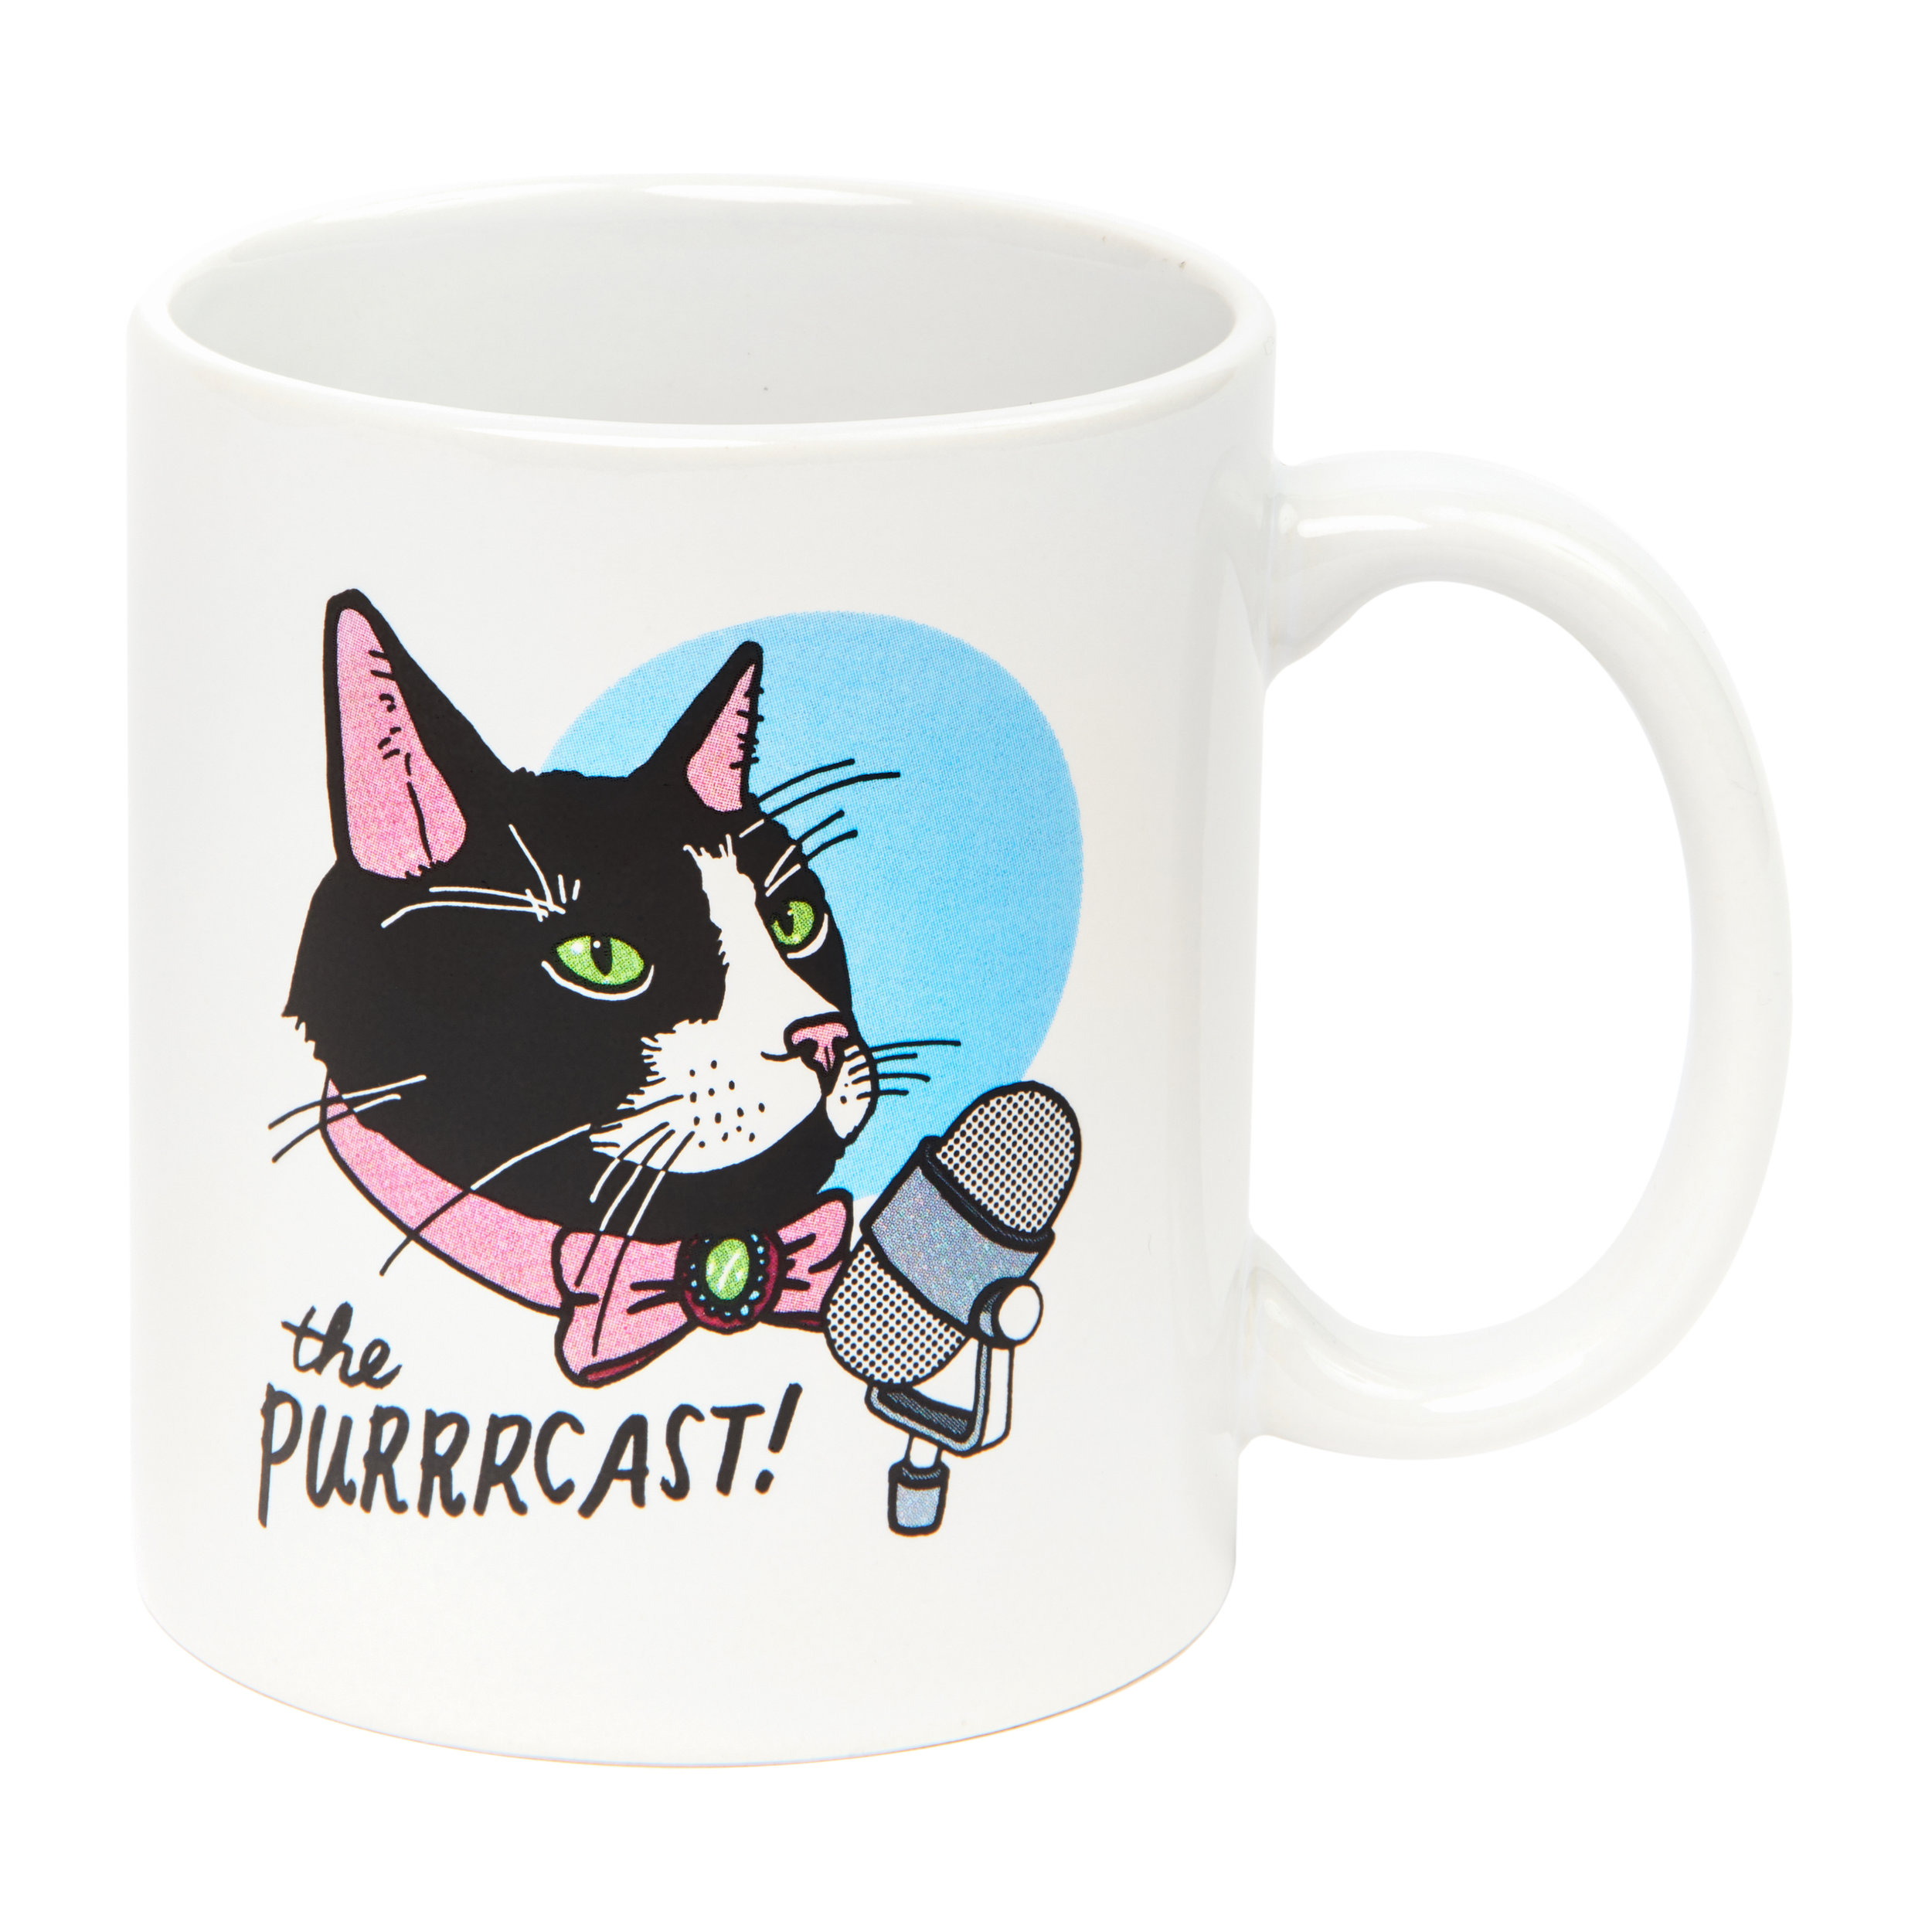 The Purrrcast: Mug $18.00